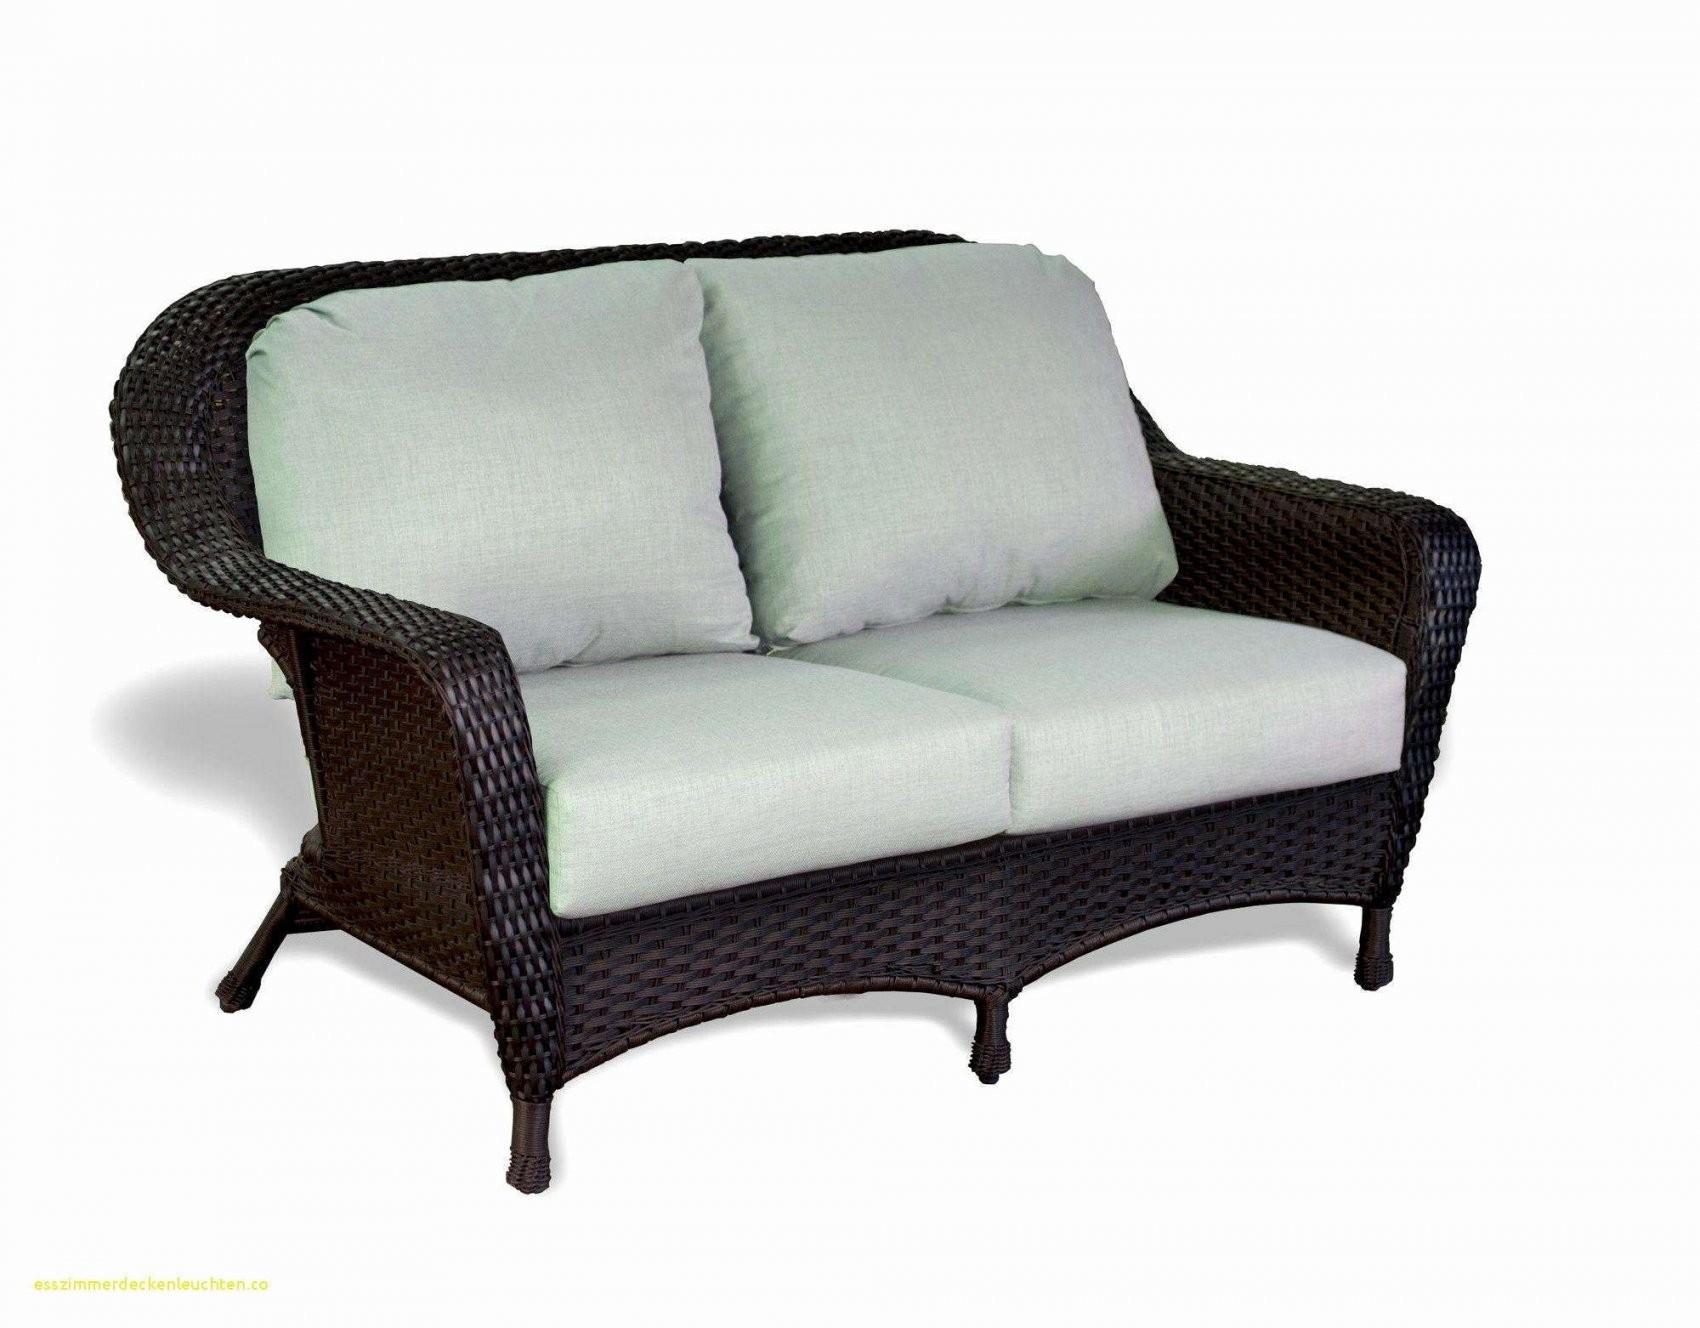 Studioliege Ikea Einzigartig Beeindruckend Sessel Liege Garten von Sessel Liege Garten Bild